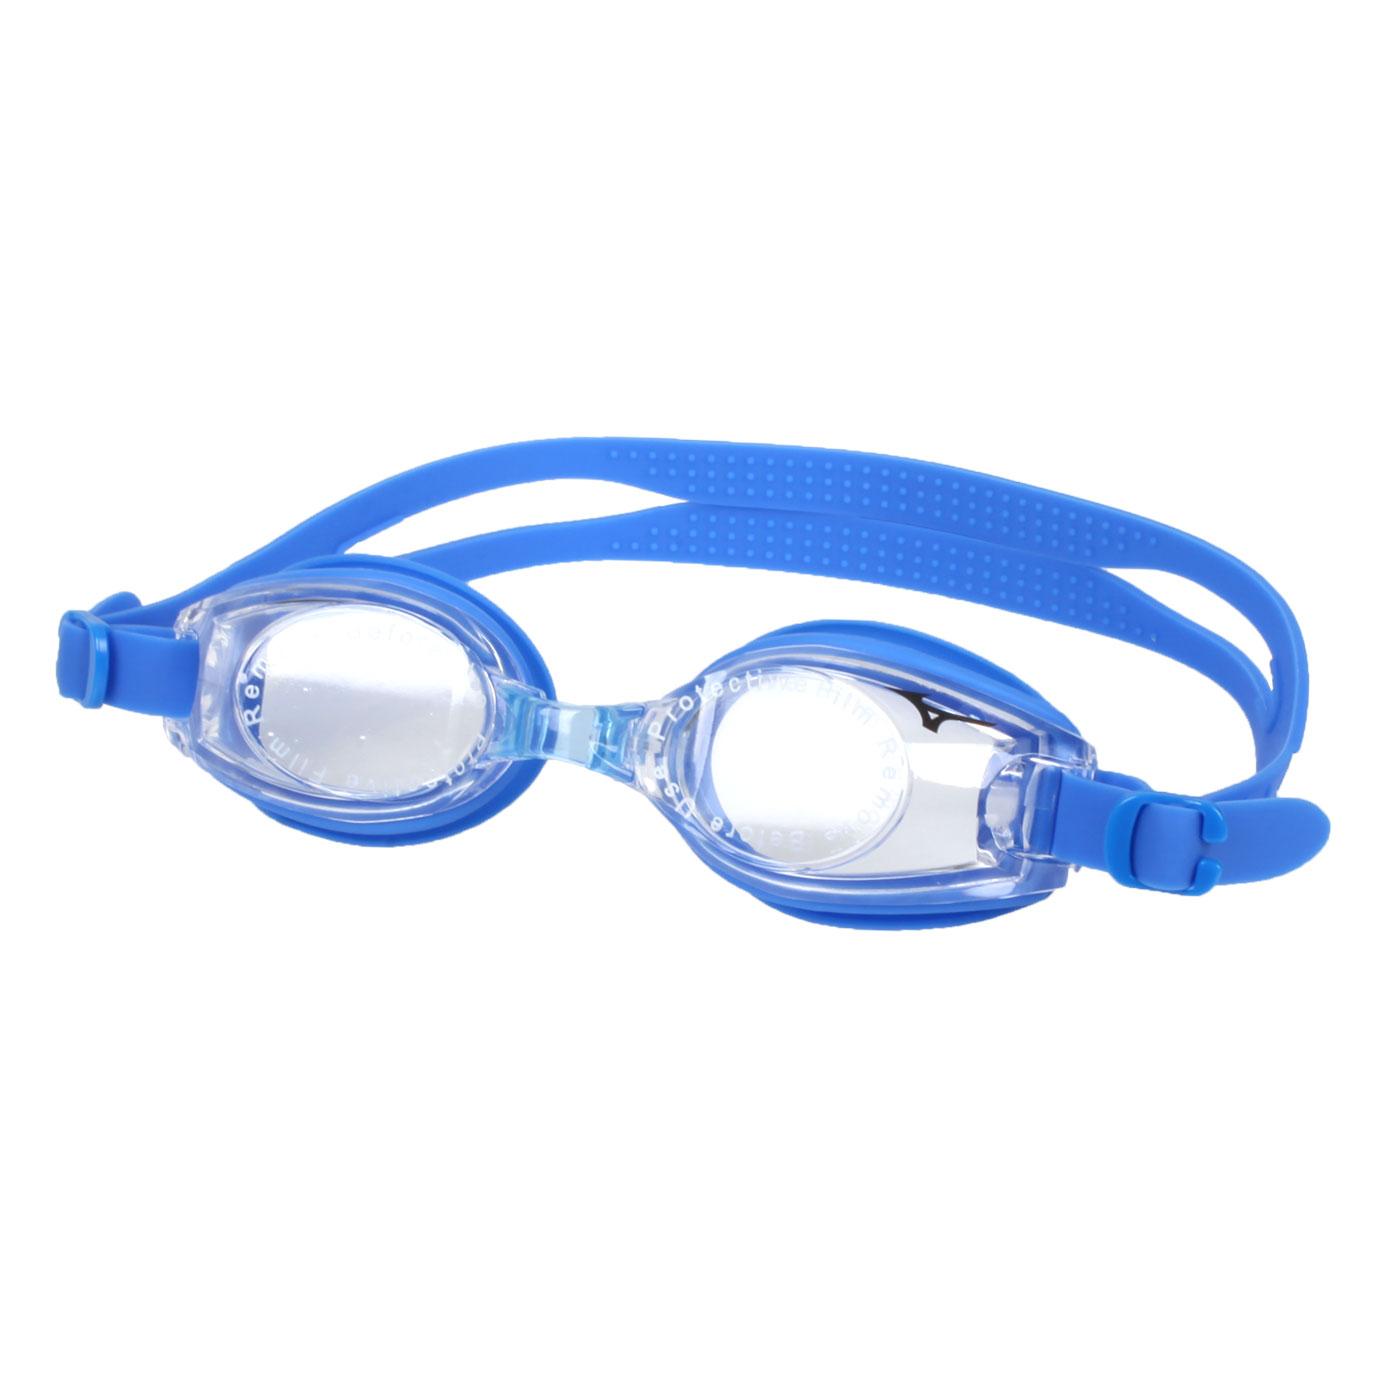 MIZUNO 兒童泳鏡  SWIMN3TF059500-09 - 透明藍